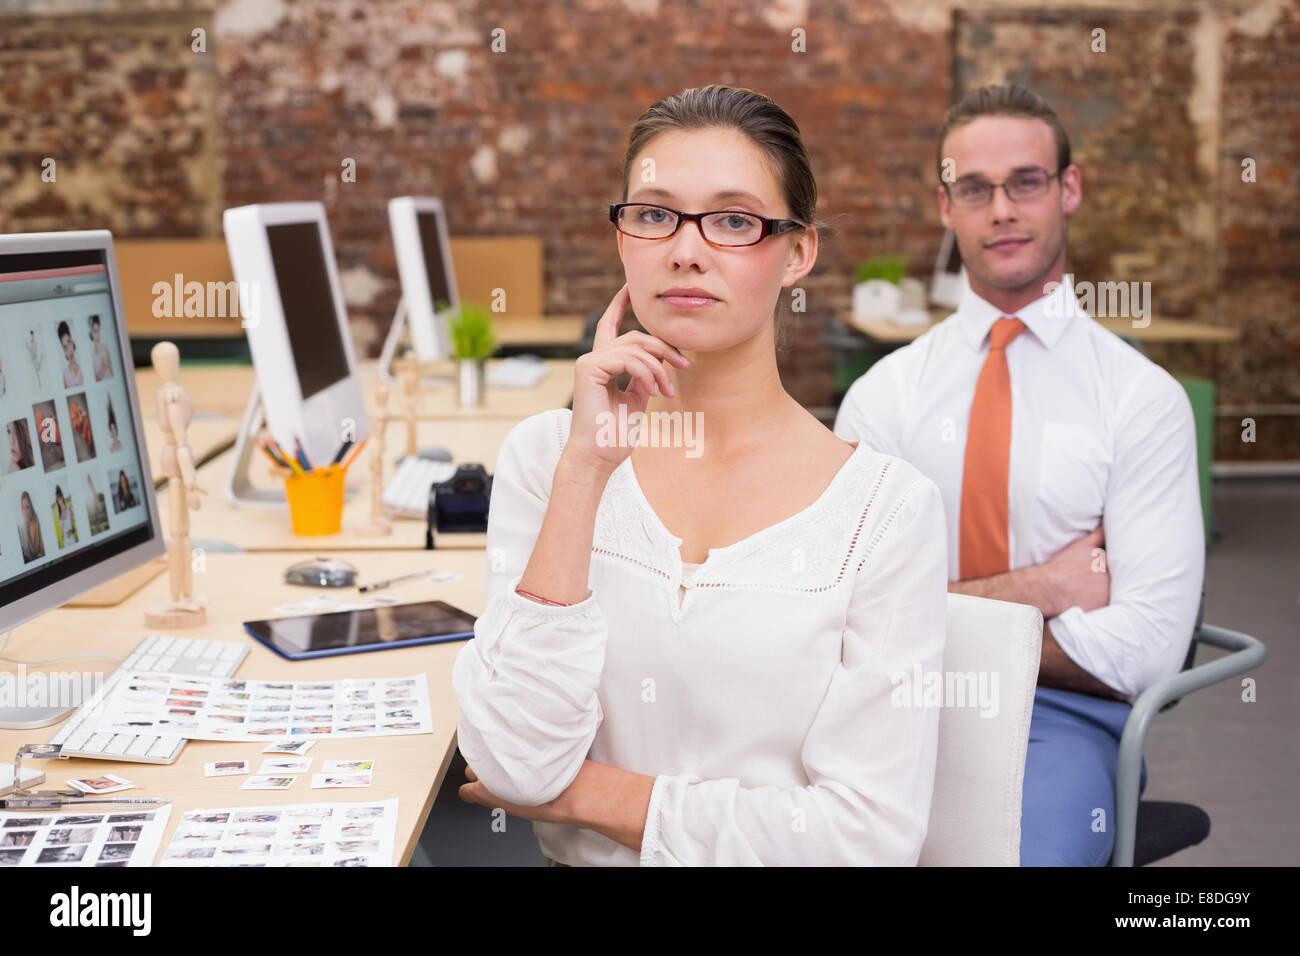 Portrait von Foto-Editoren im Büro Stockbild